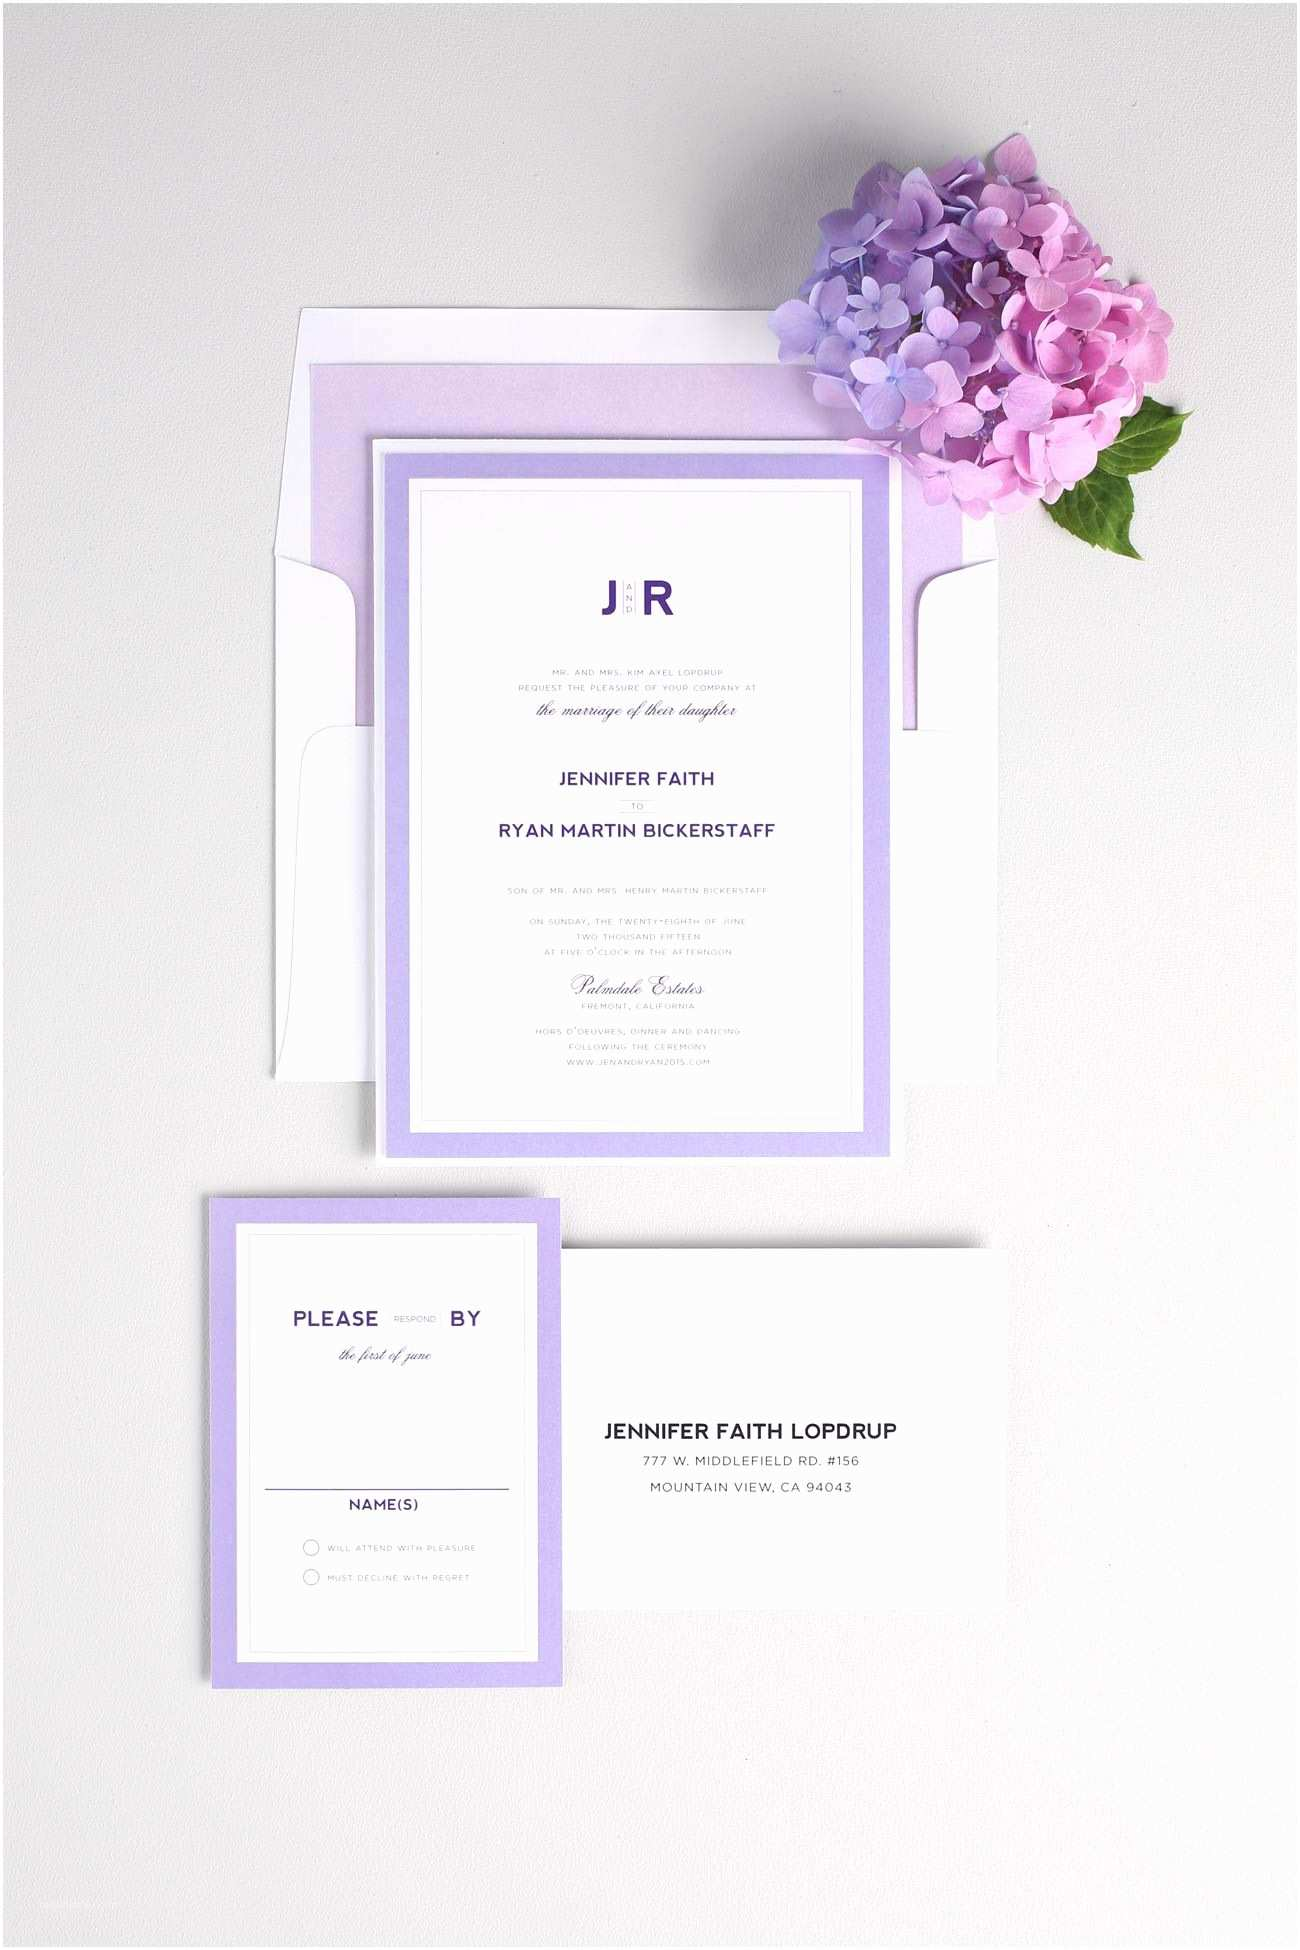 Standard Wedding Invitation Dimensions Make Your Own Standard Wedding Invitation Size Free